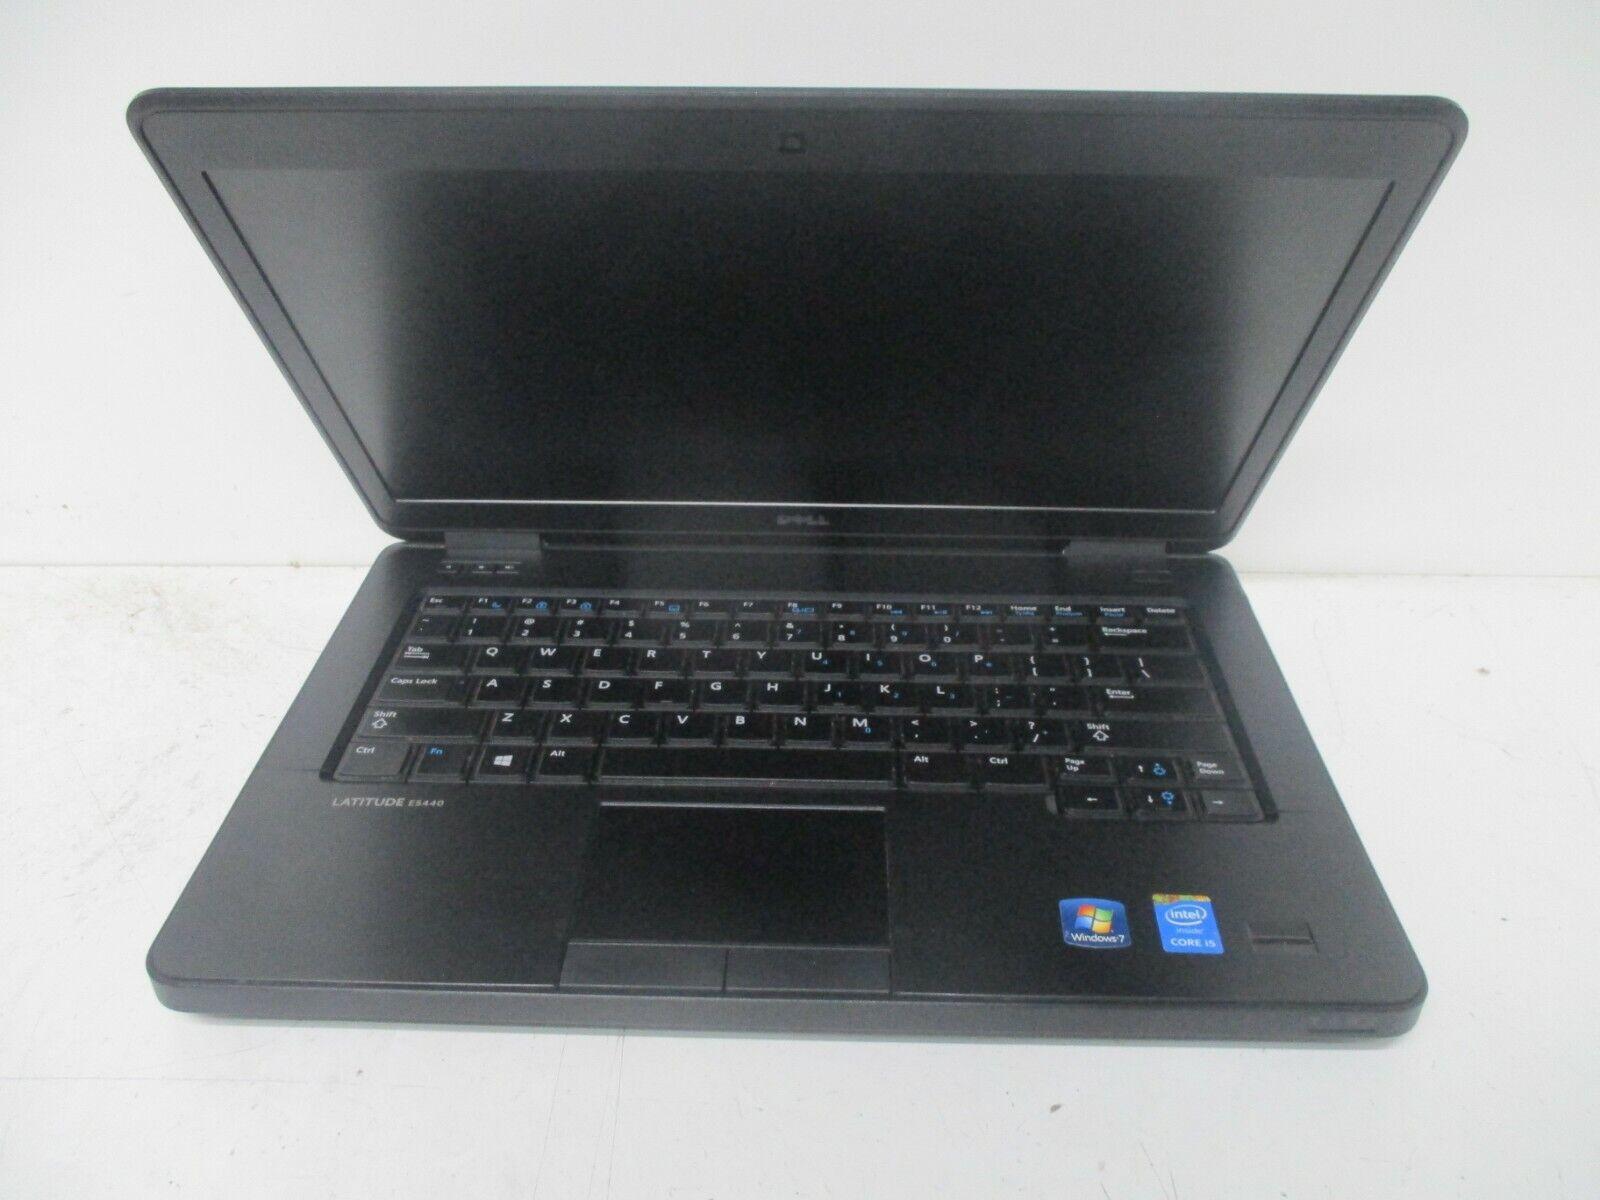 Dell Latitude E5540 Intel Core i5(4200U) 4GB DDR3L No OS-No HDD BIOS Locked 5878